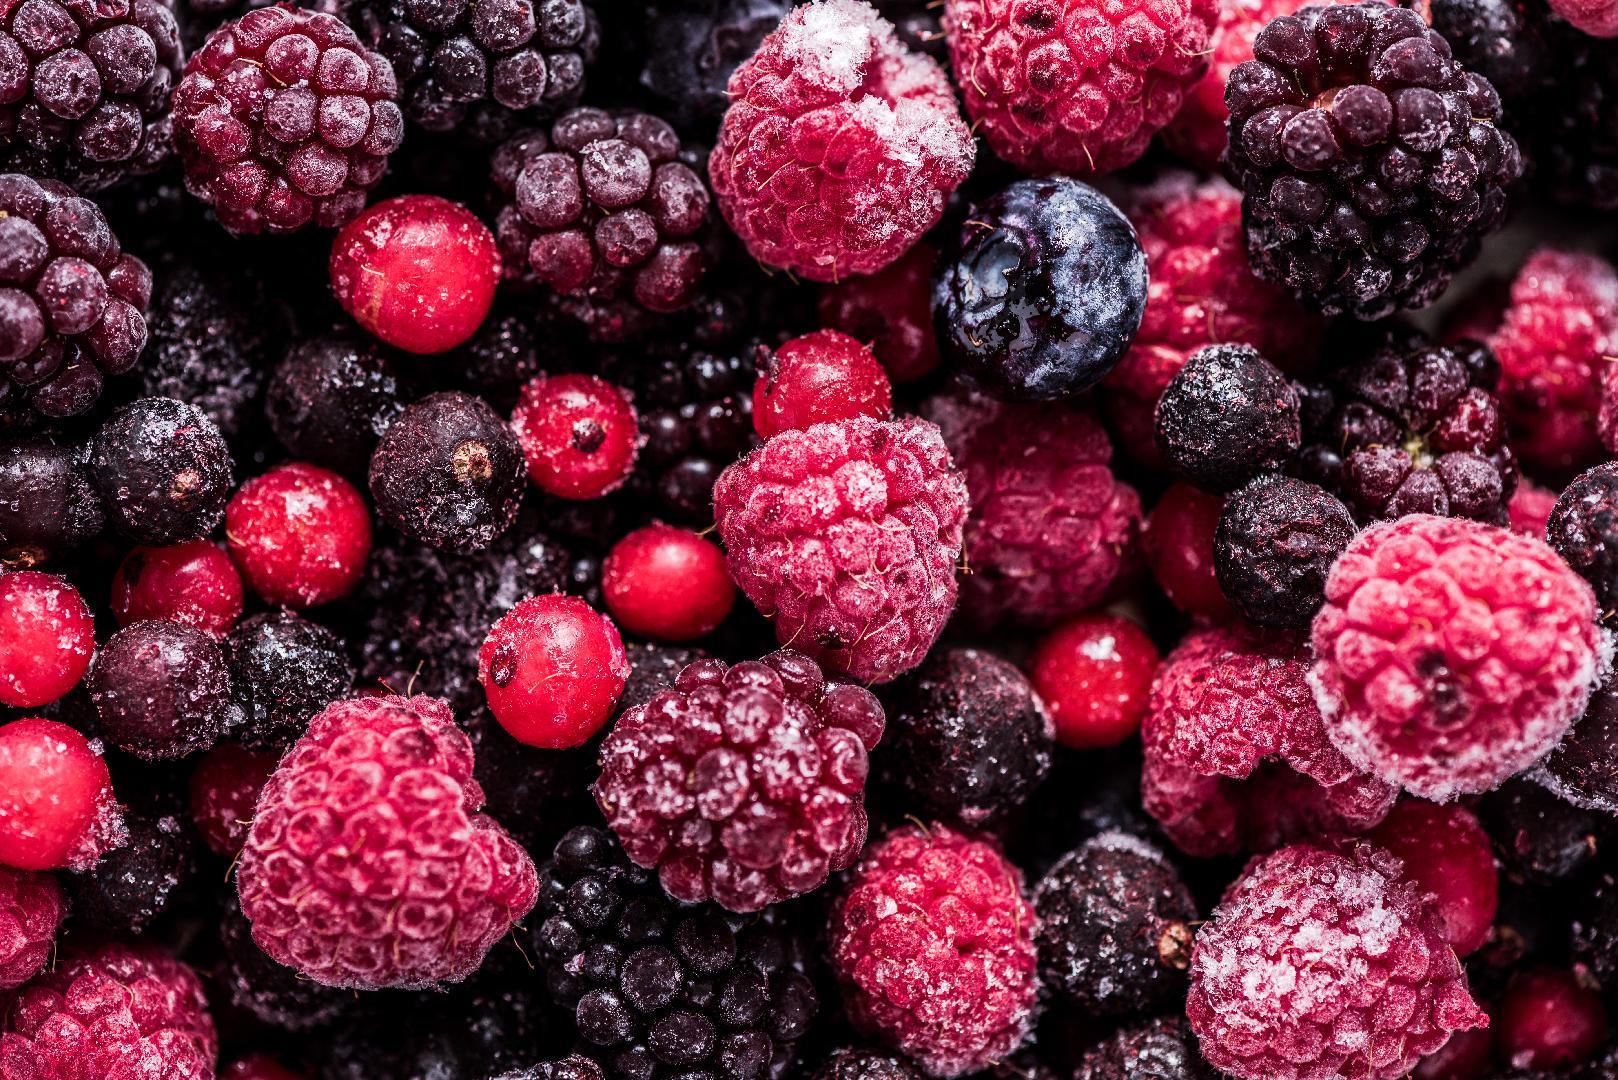 Costco and Kroger Recall Frozen Berries for Possible Hepatitis A